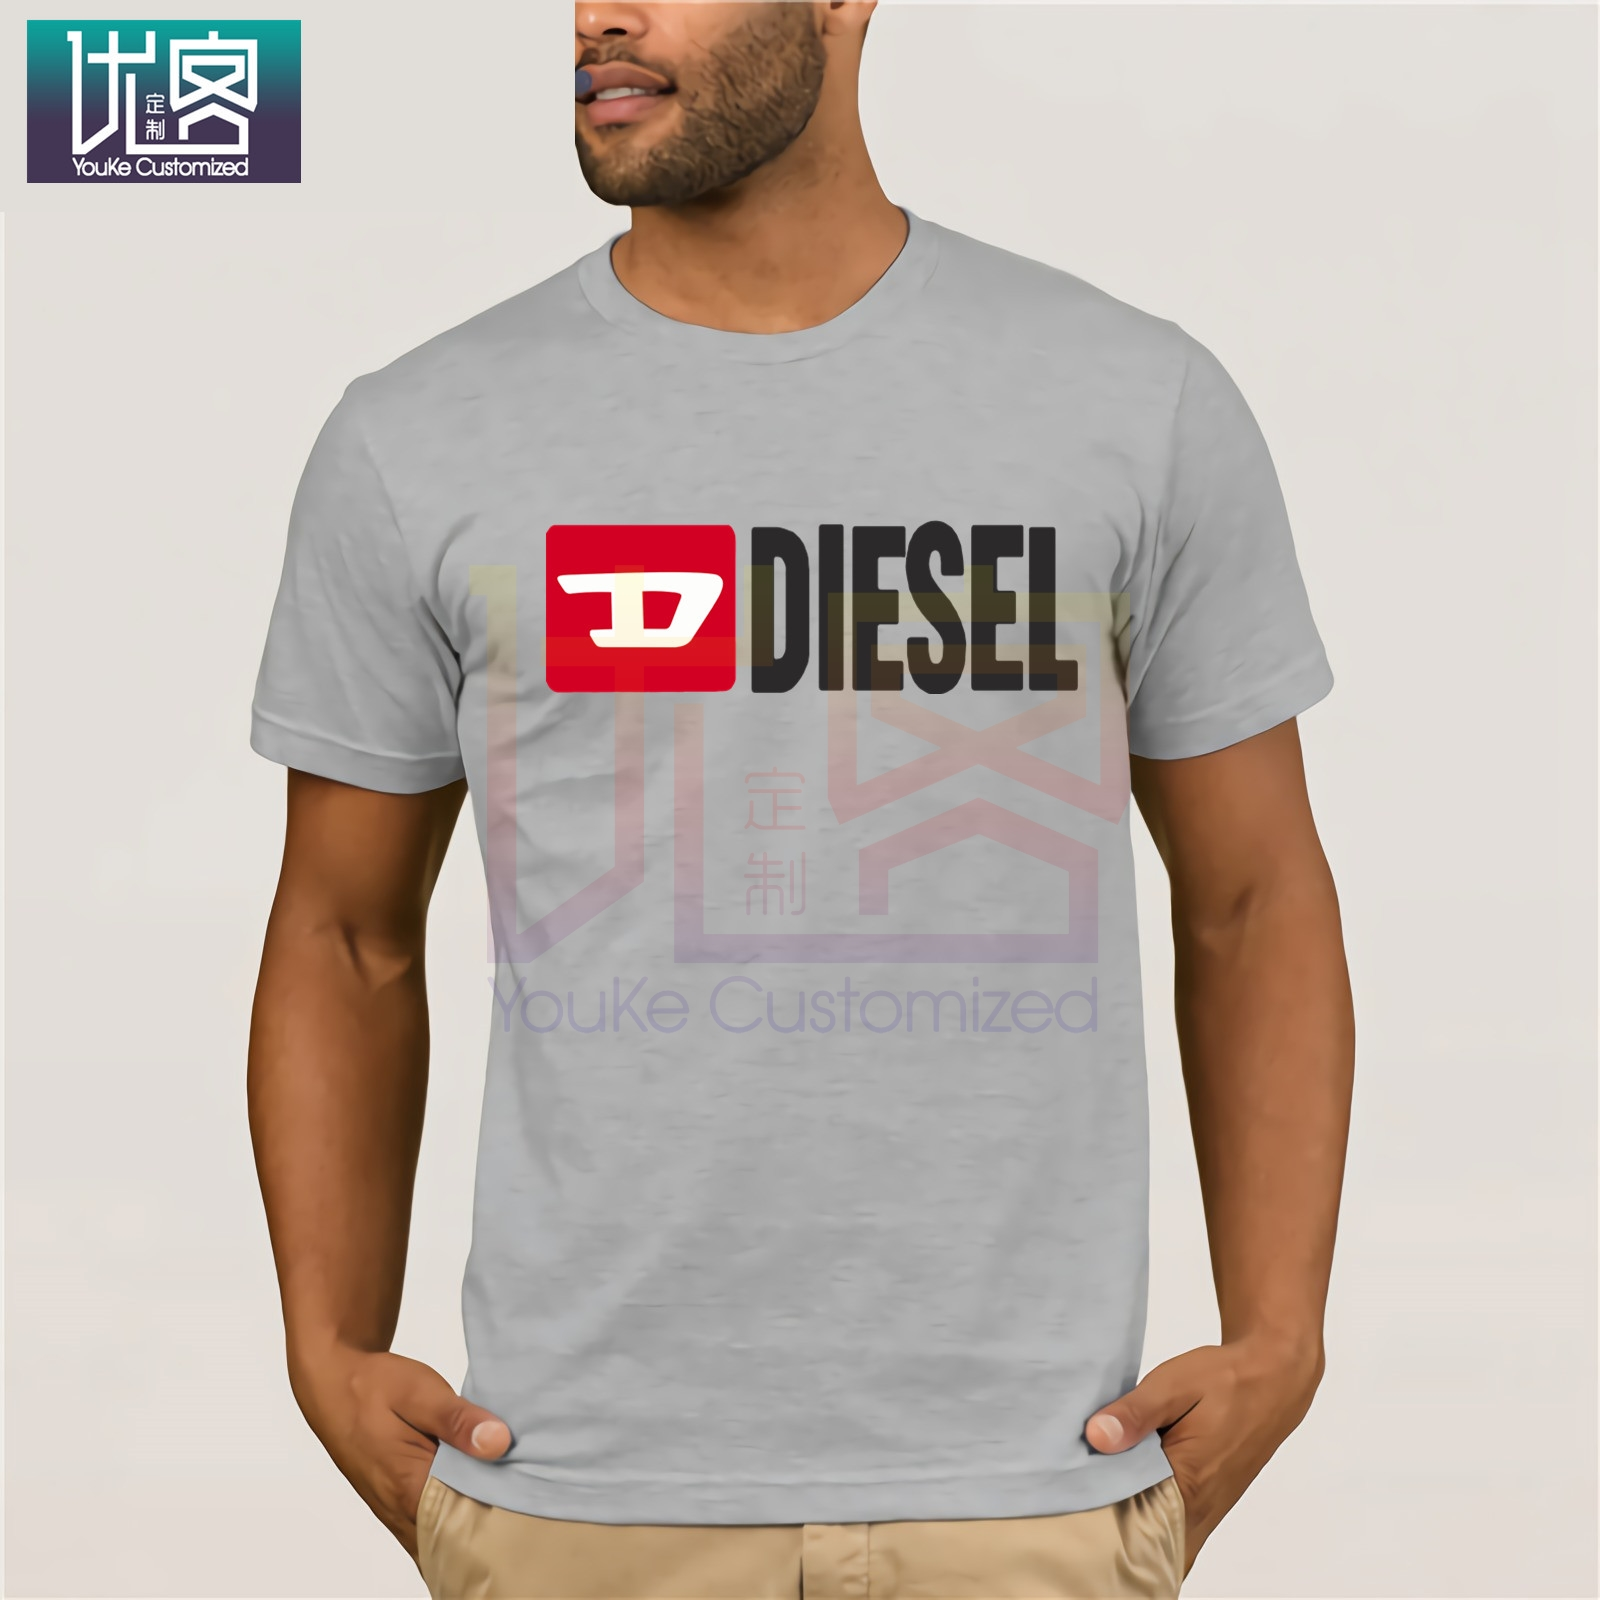 2019 Fashion Men-s Diesel-t-shirt-Custom-diesel-O-Neck-Normal-Sunlight-Building-Summer-Style